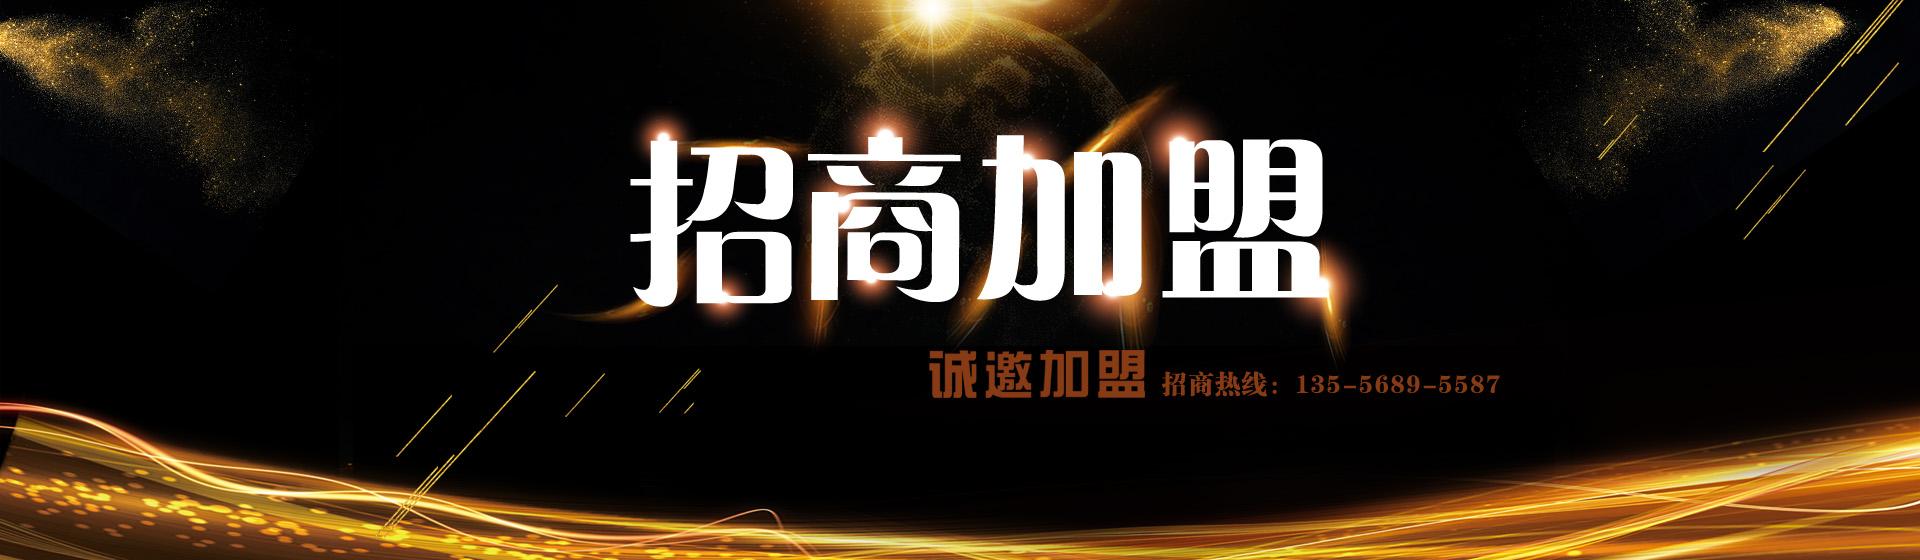 http://www.718883.live/p-dailijiameng.html